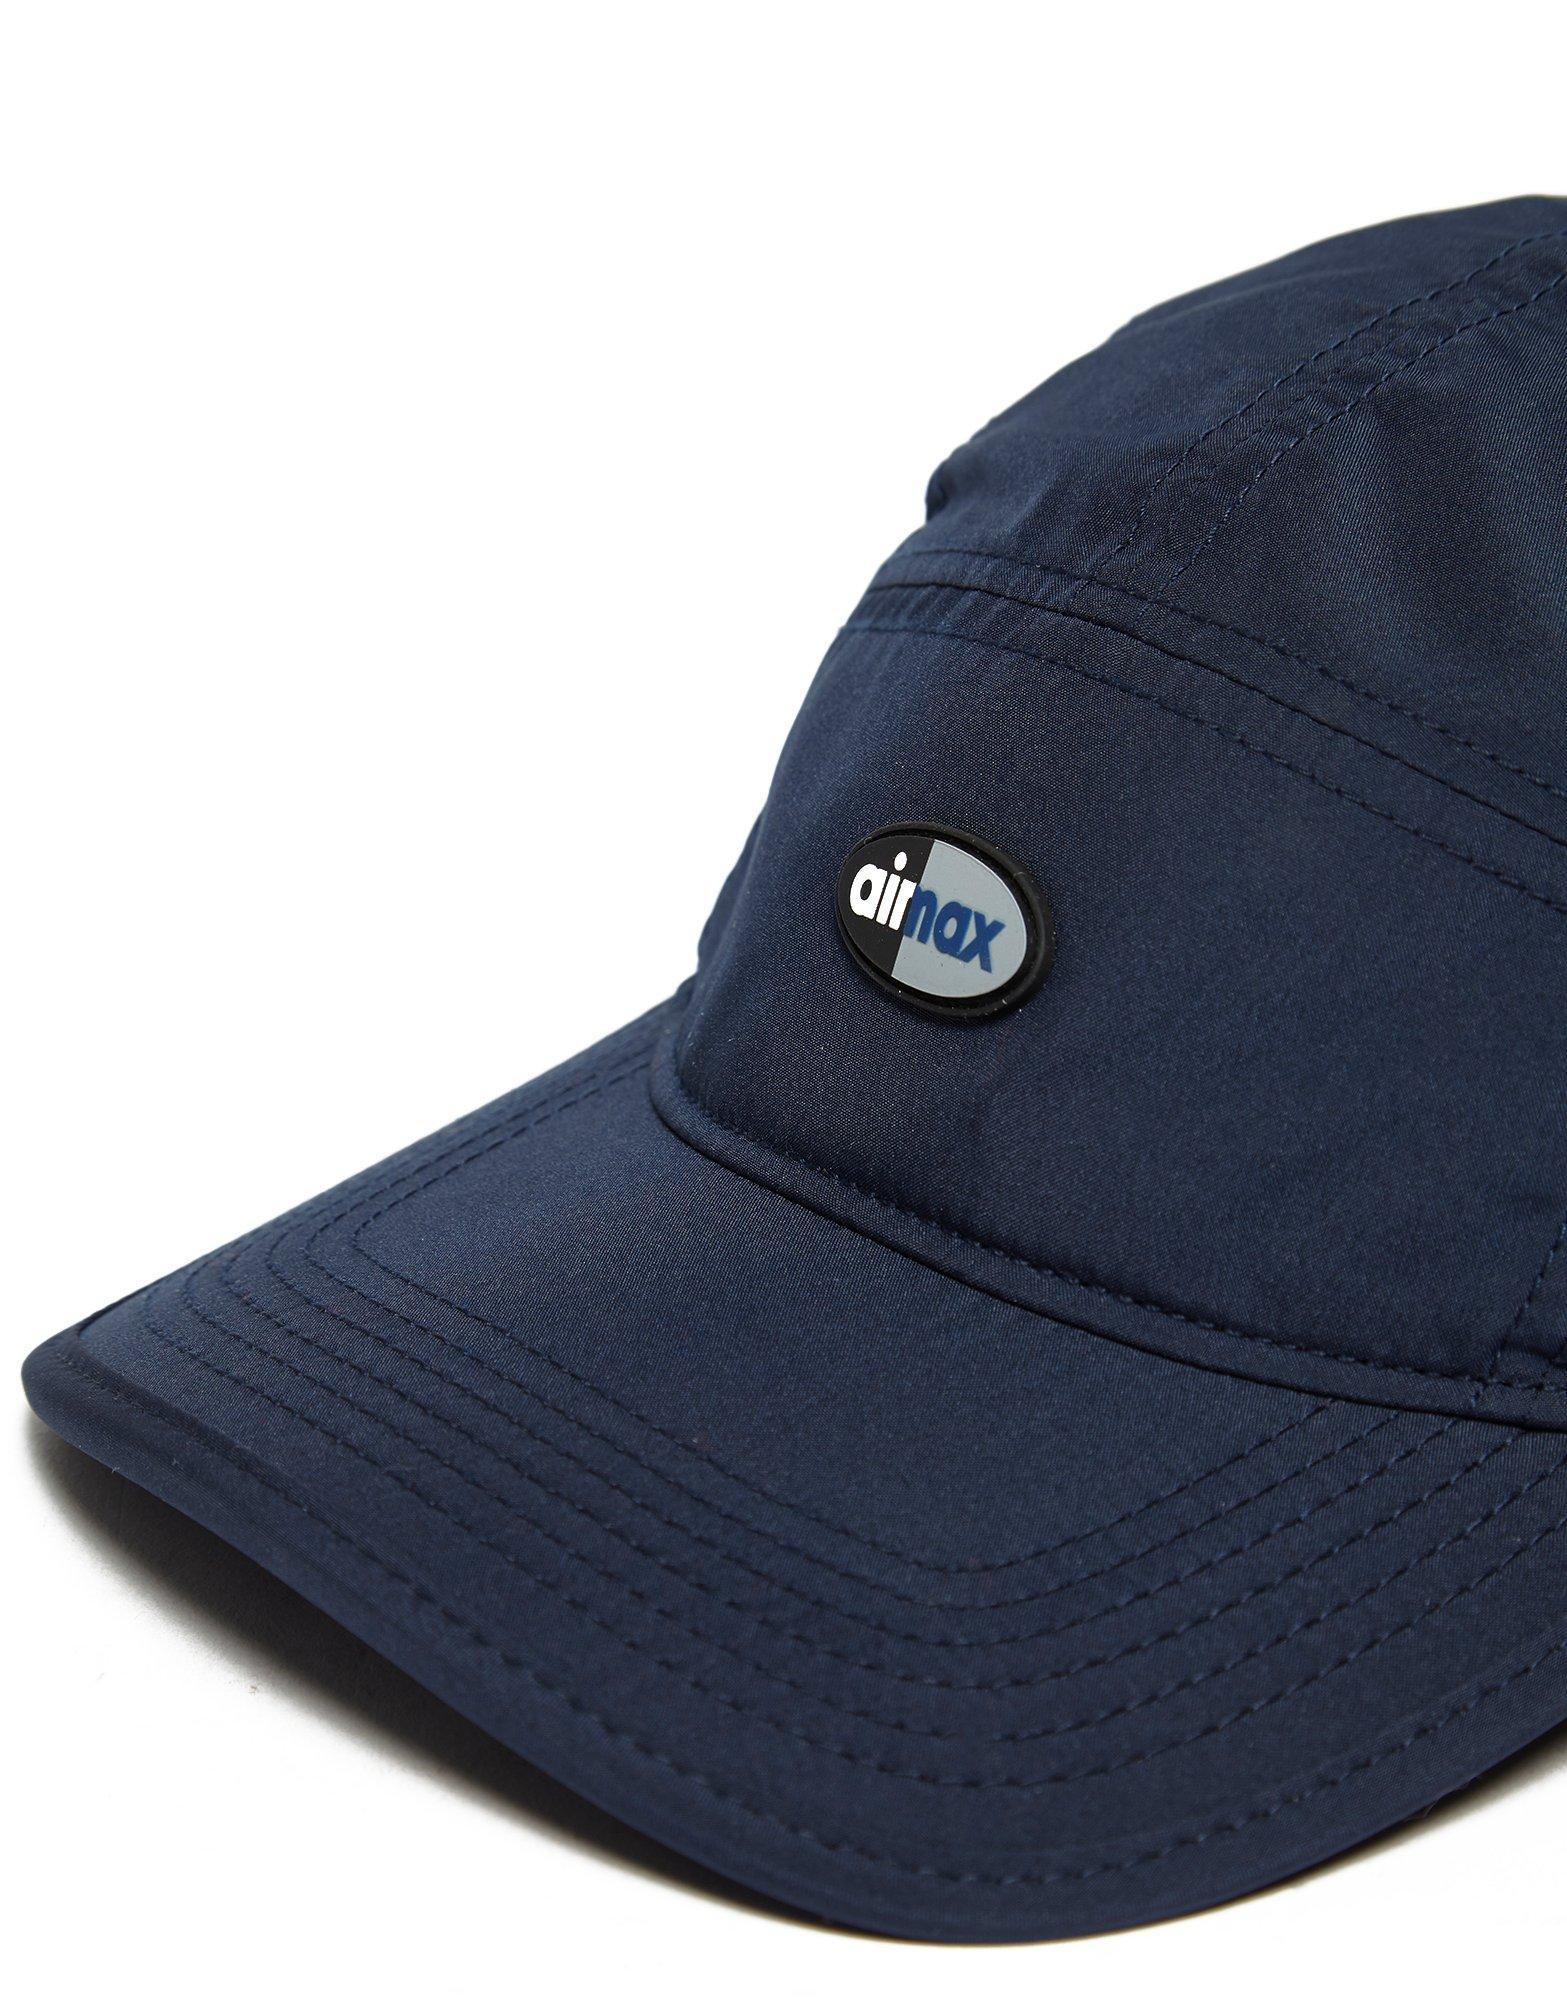 Lyst - Nike Air Max Cap in Blue for Men 544e3a52744